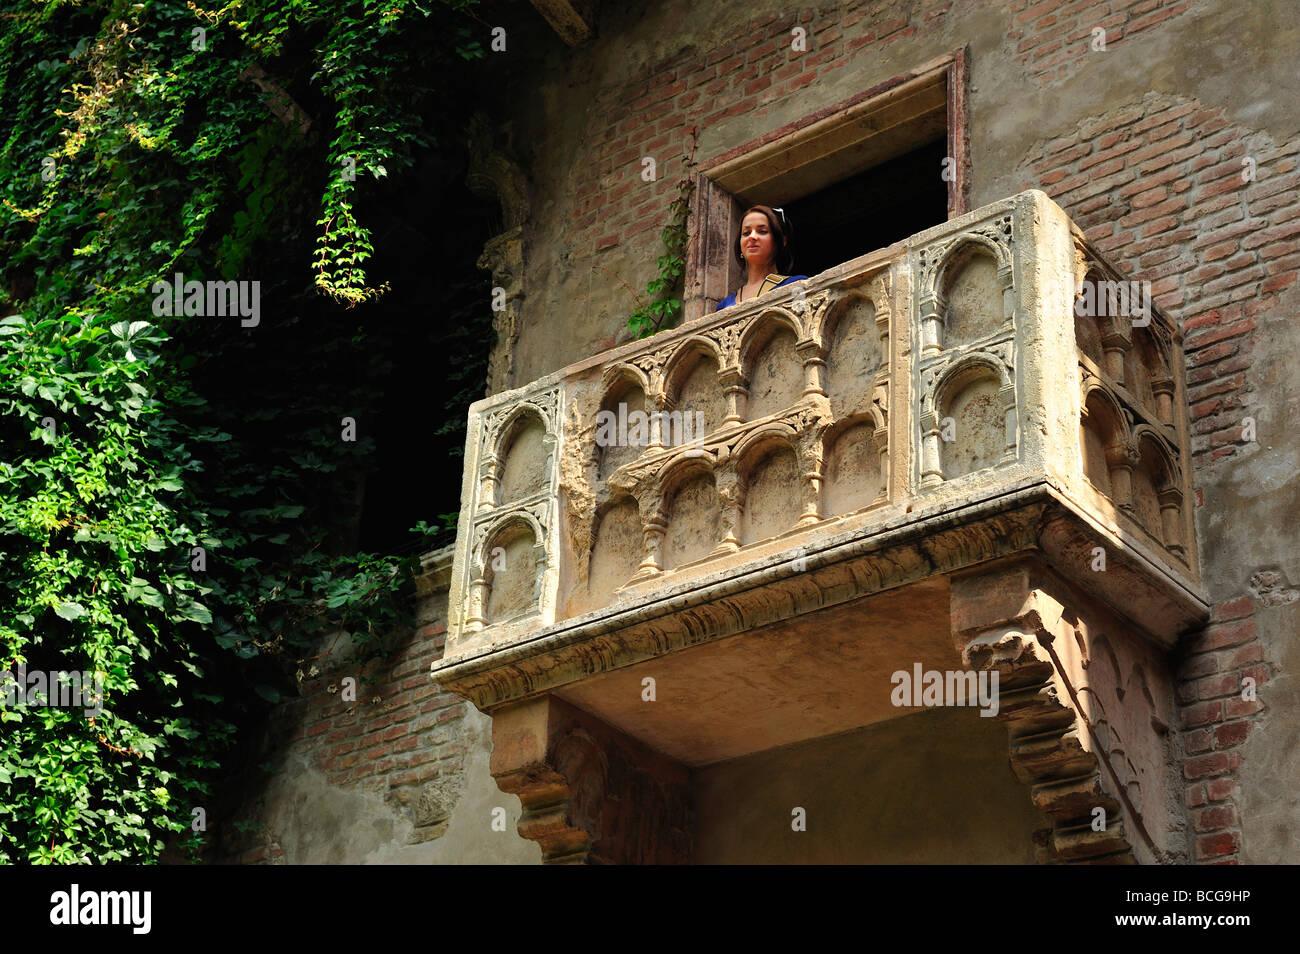 La Casa de Julieta, en Verona, provincia de Verona, Véneto, Italia Imagen De Stock